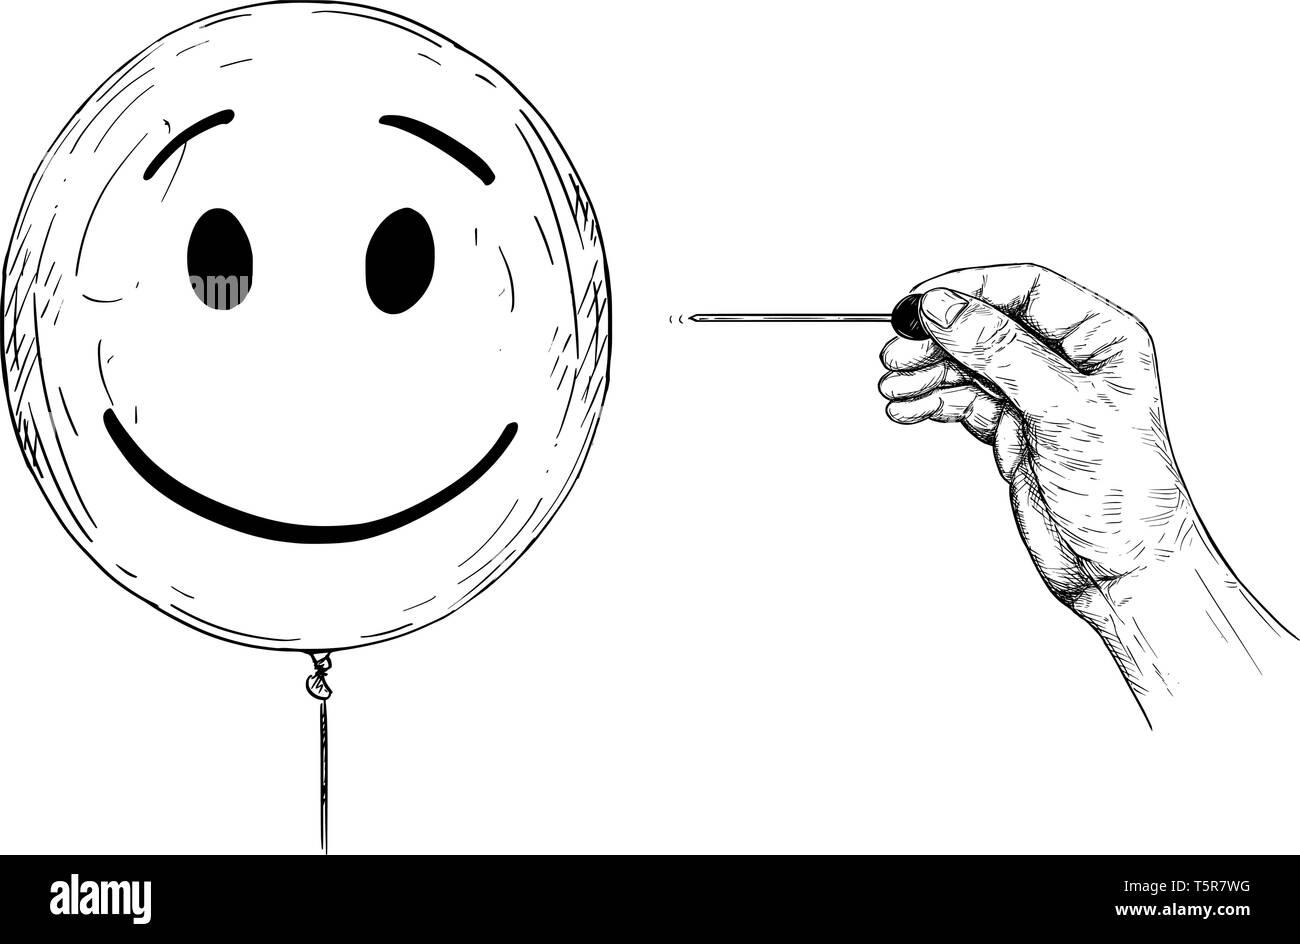 Balloon Popping Cartoon Comic